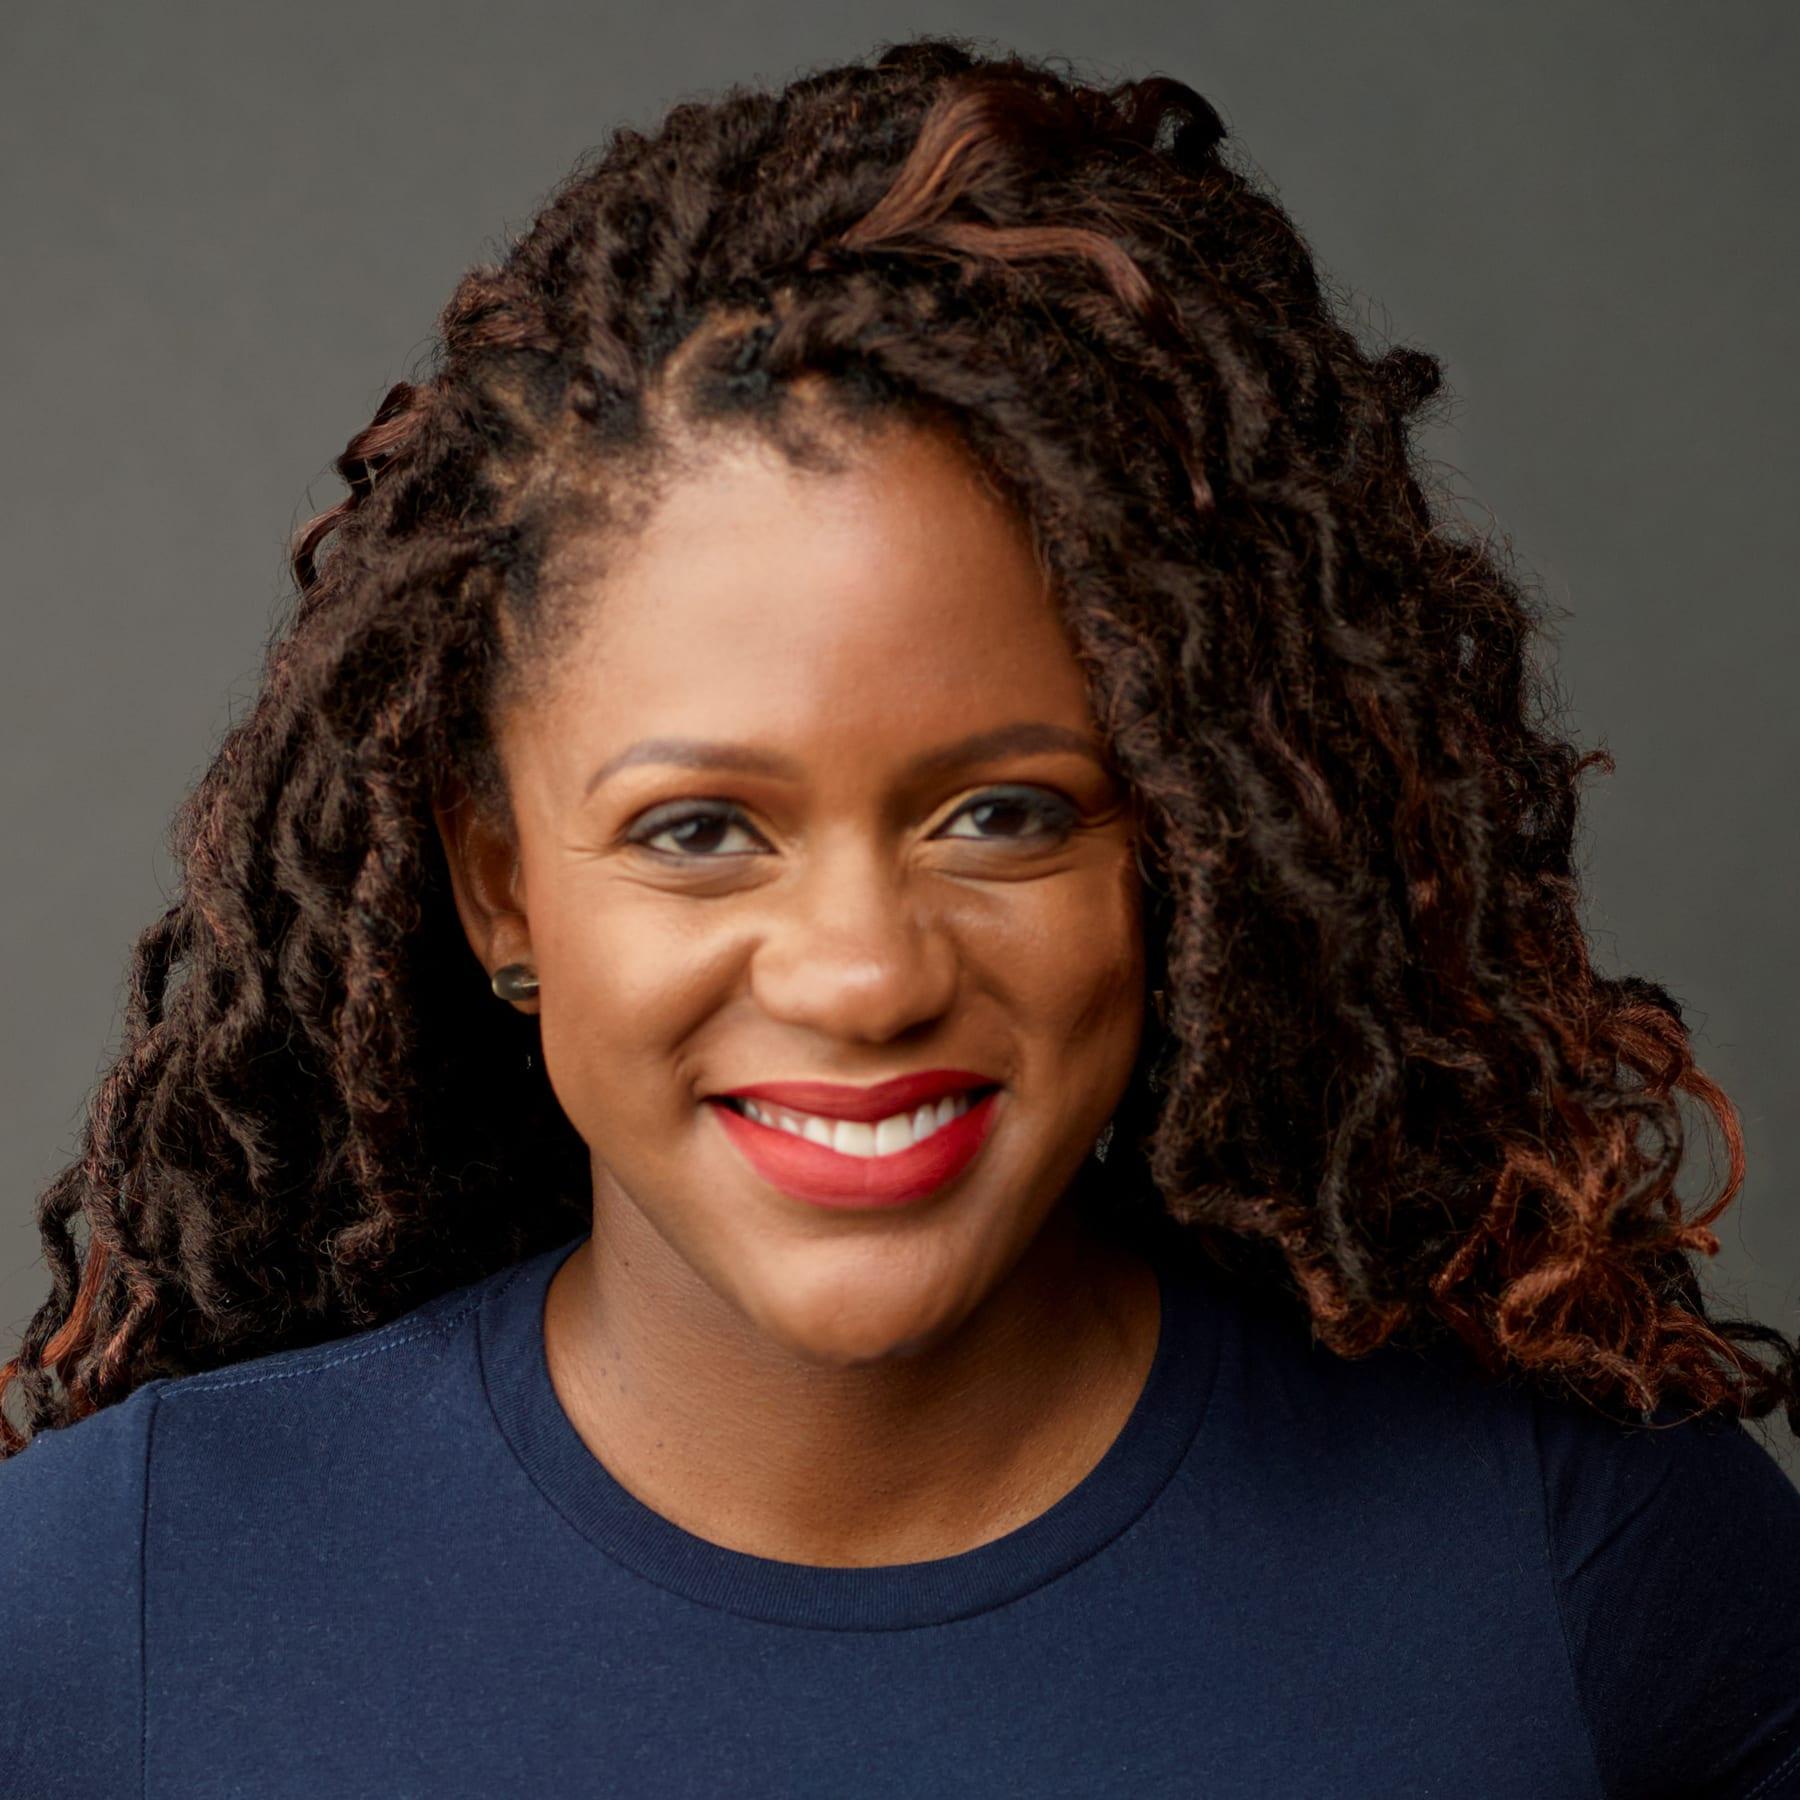 Monique Woodard